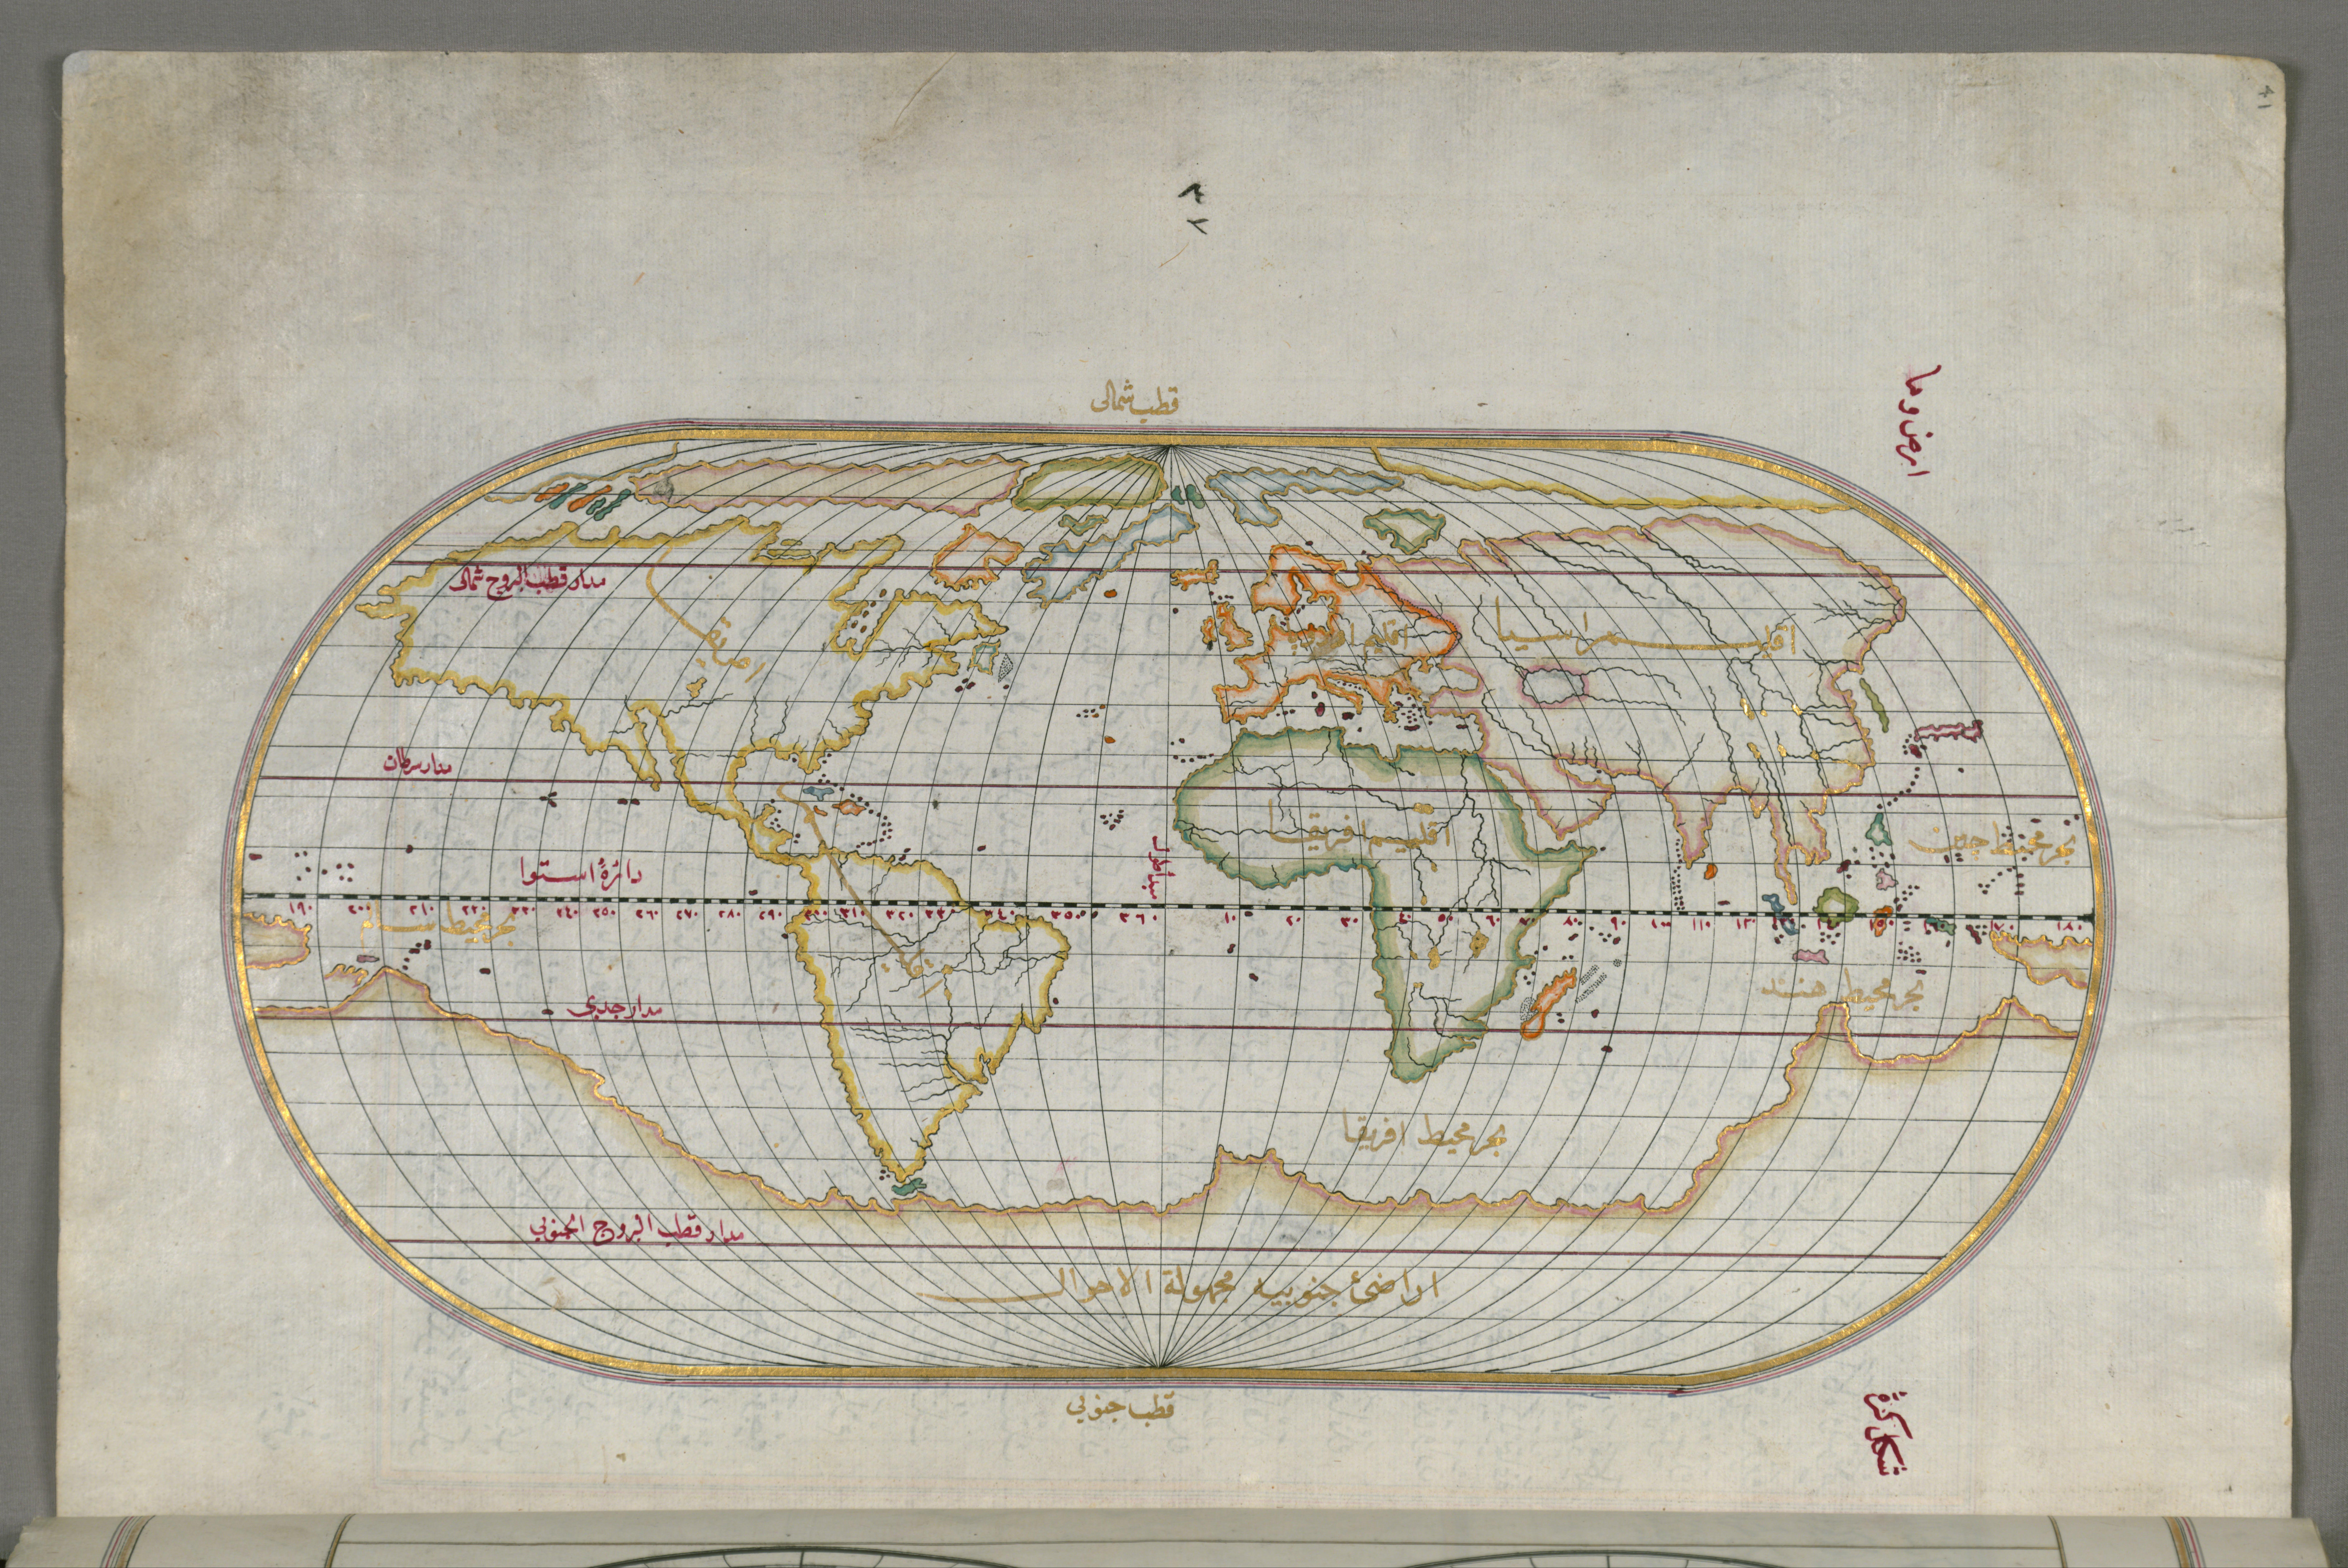 Filepiri reis oval world map google art projectg wikimedia filepiri reis oval world map google art projectg gumiabroncs Gallery